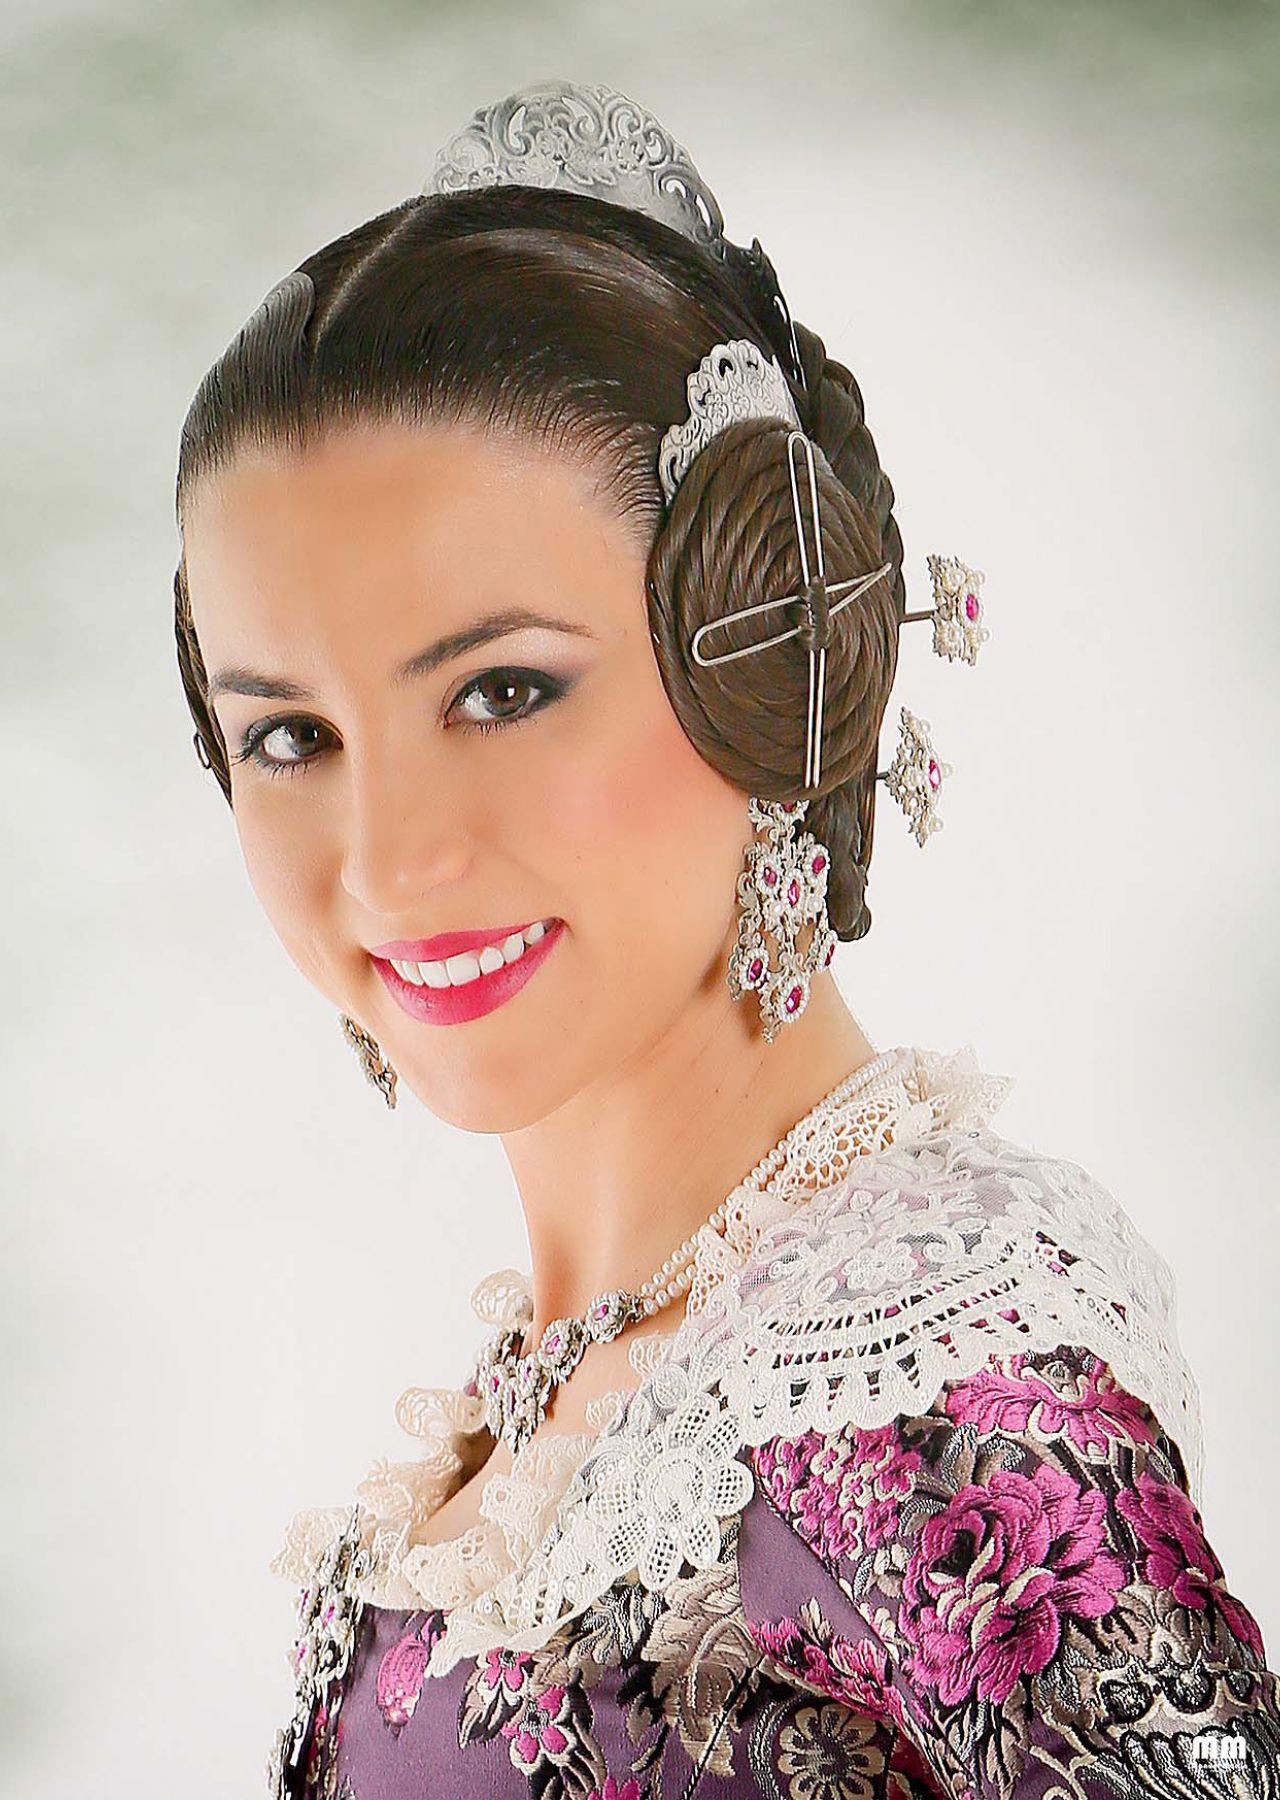 Rebeca Pardo Castillo